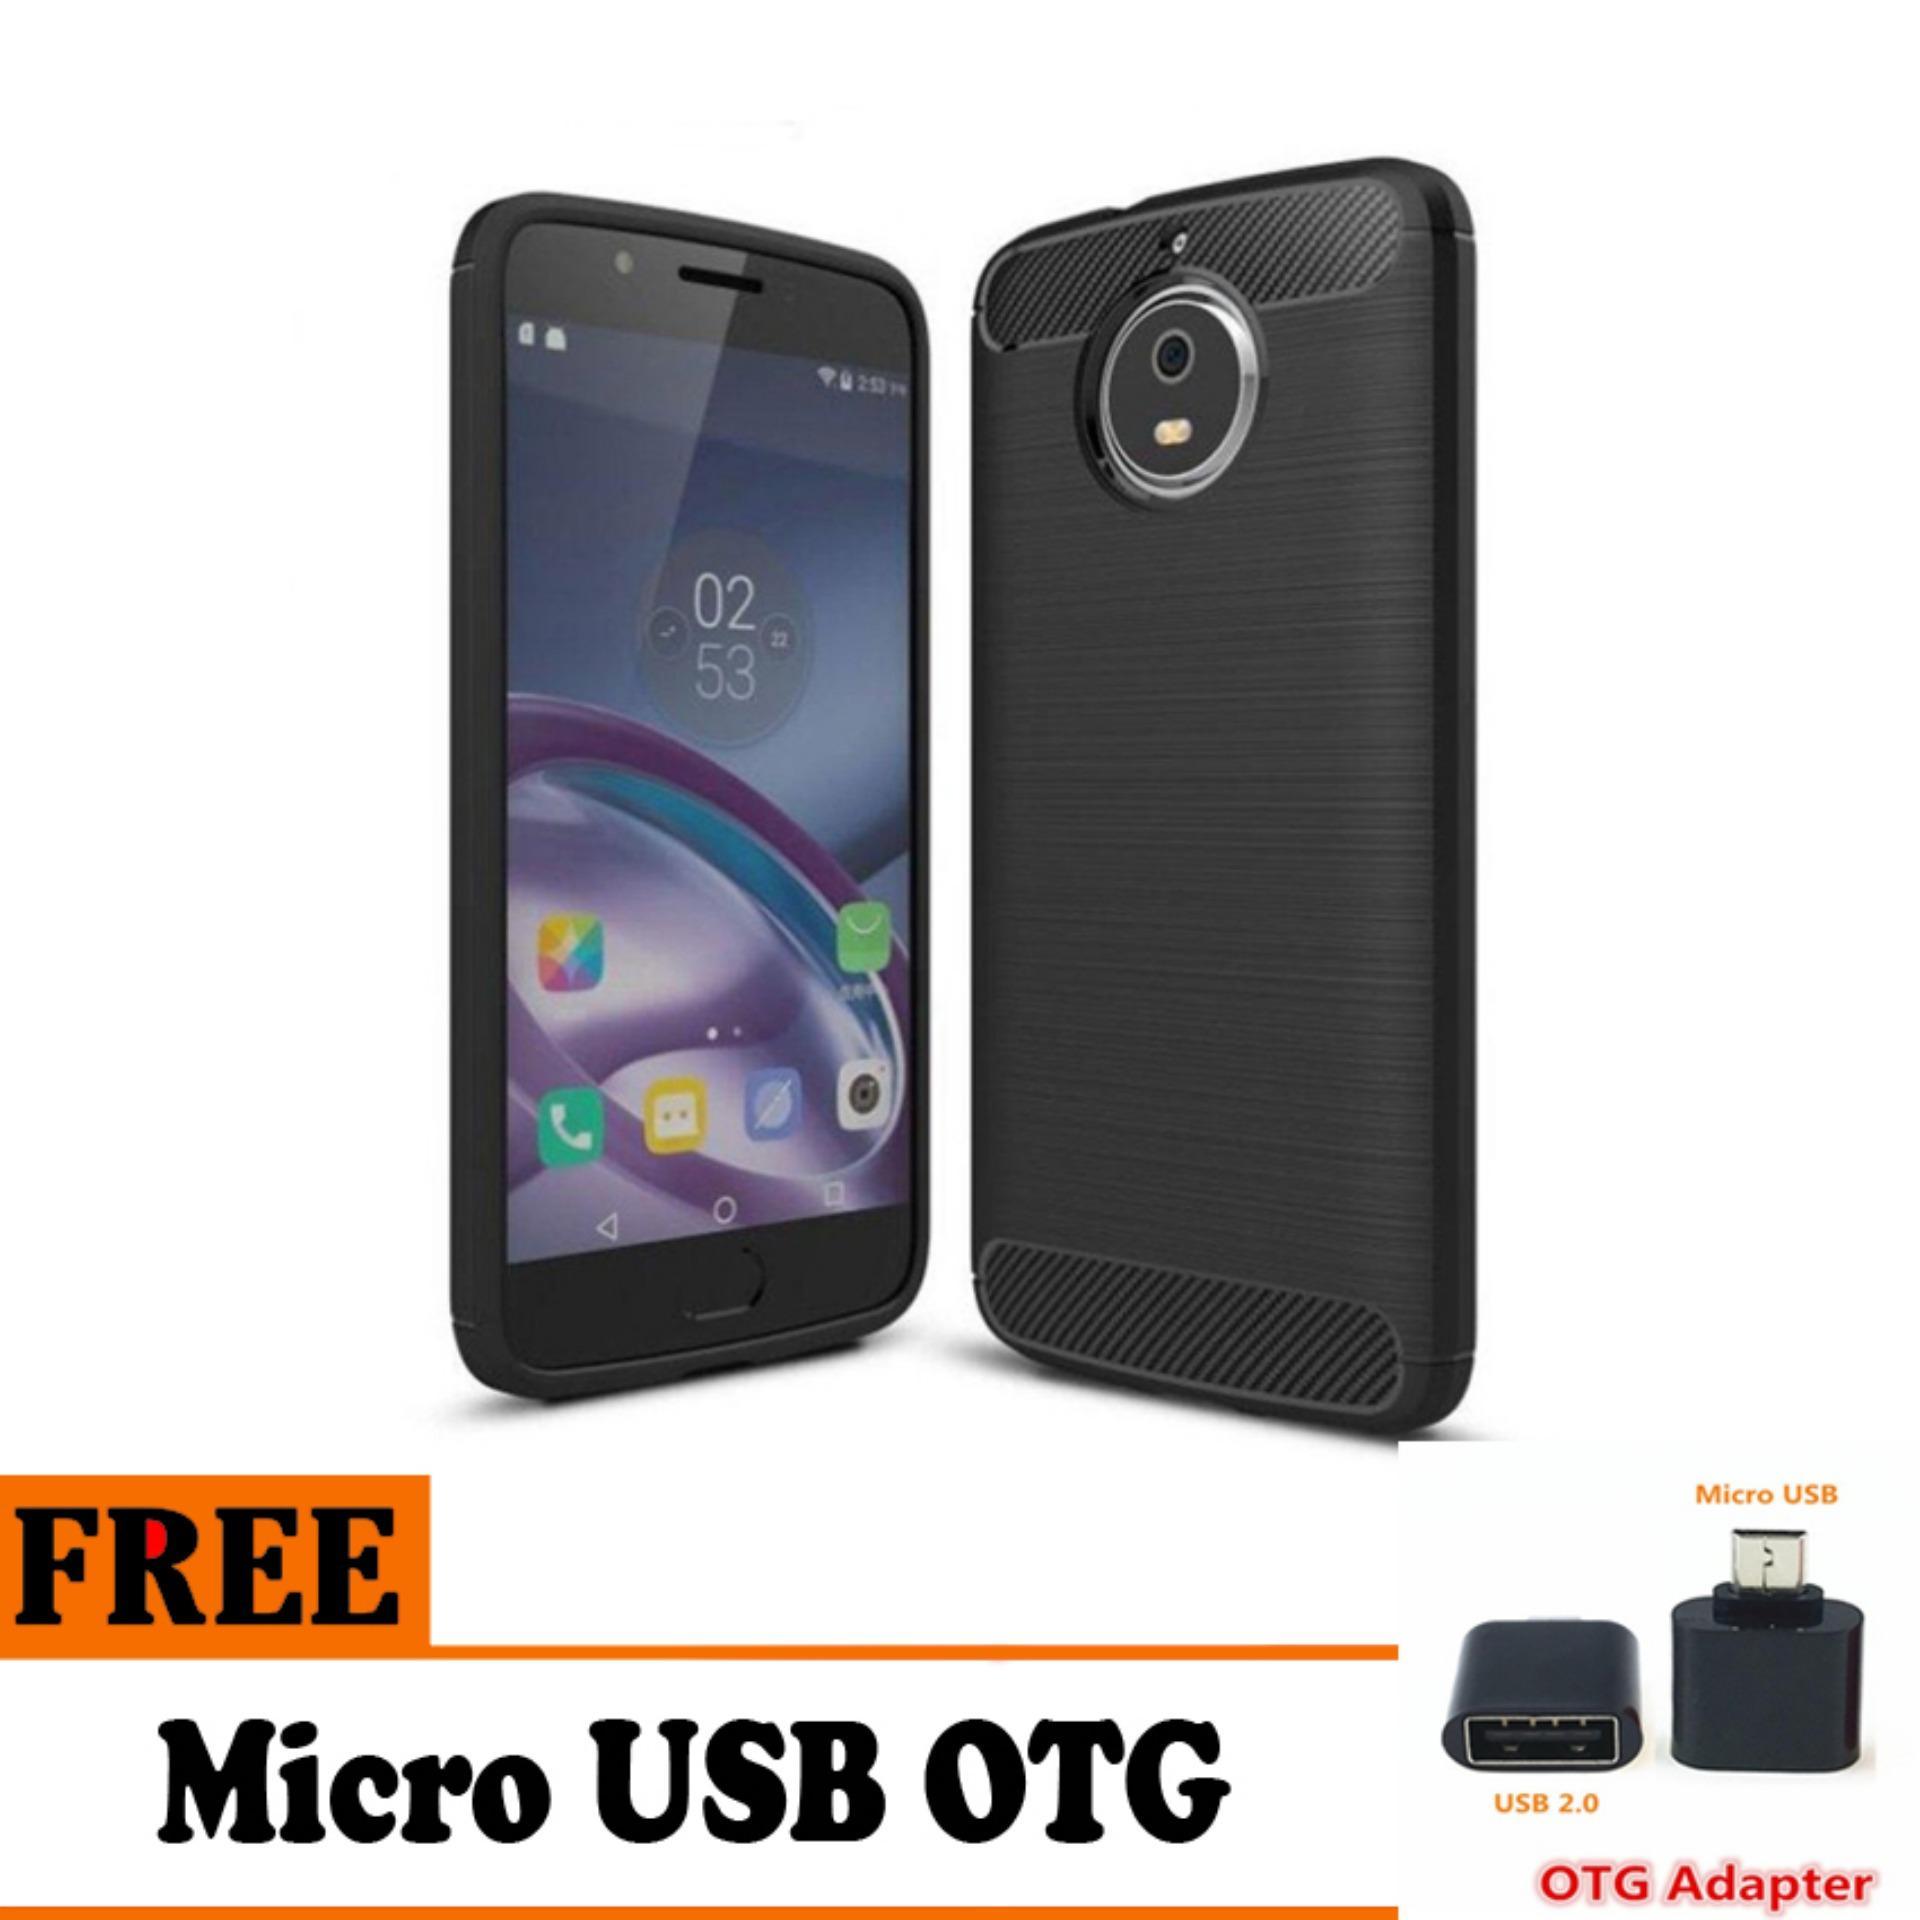 Softcase Ipaky Shockproof Matte Black karbon untuk Motorola Moto G5 S Plus  - Free USB OTG